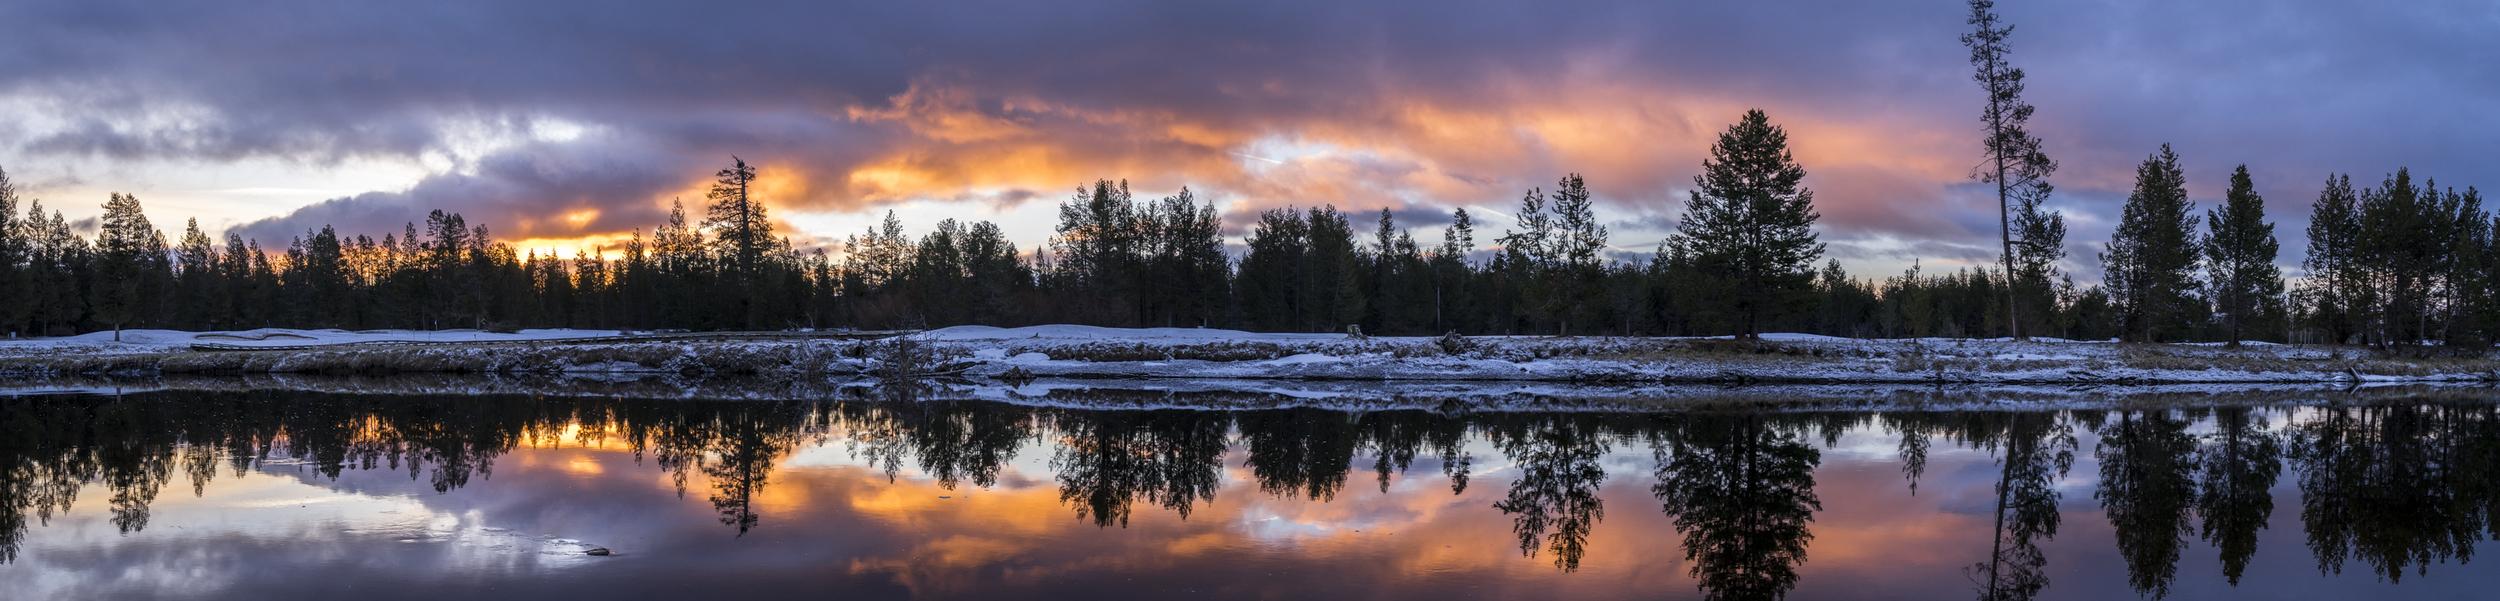 Sunrise on the Deschutes River, Oregon, 2016